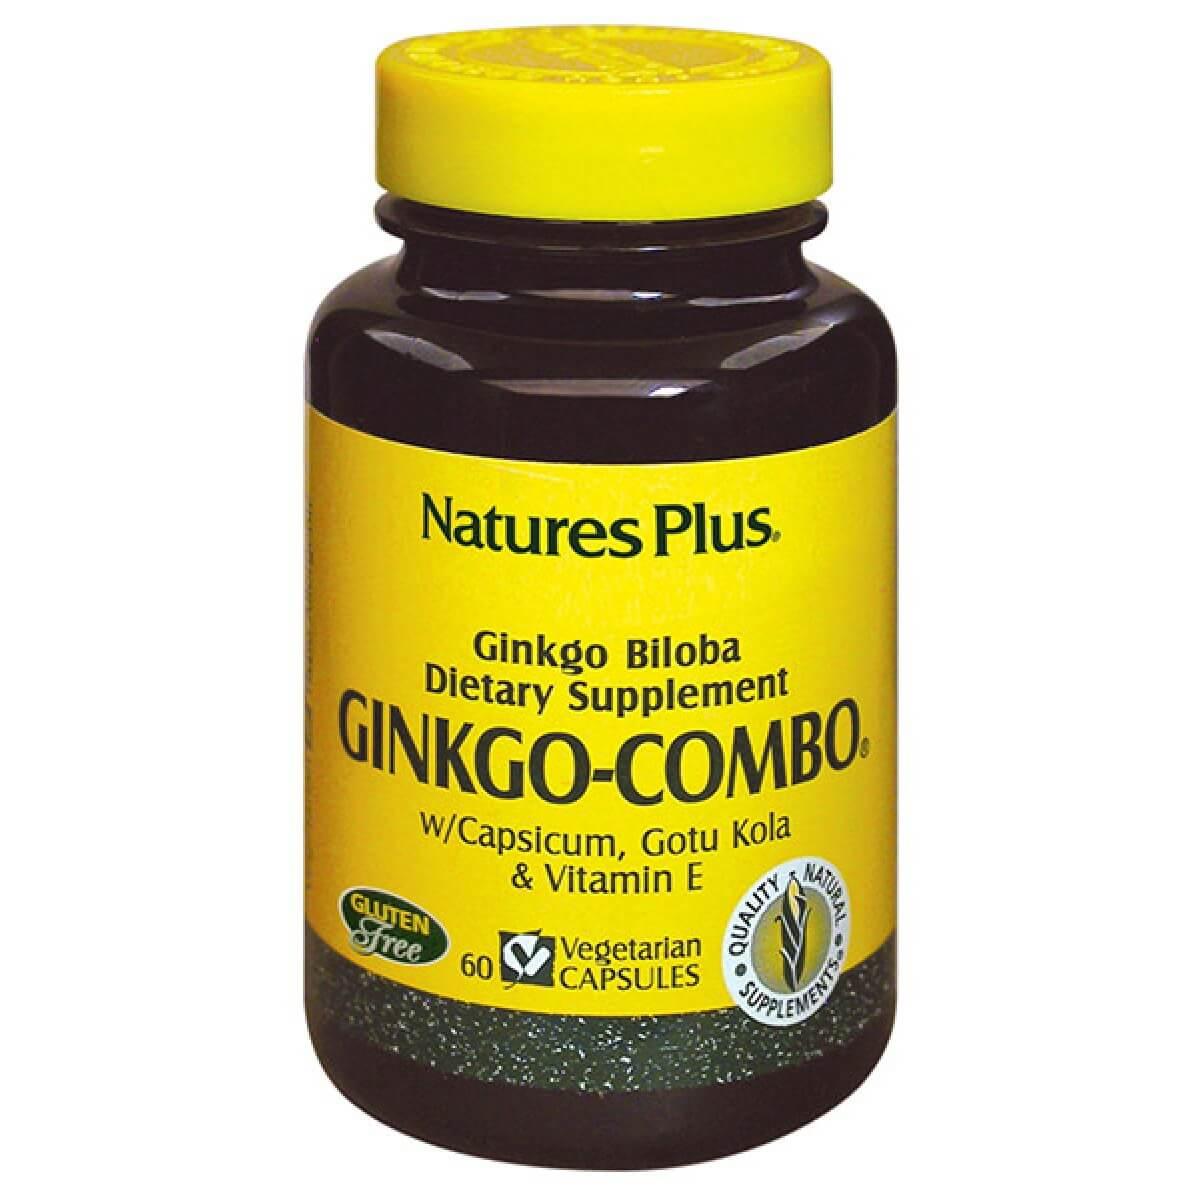 Natures Plus Ginkgo Combo Φόρμουλα για τη Βελτίωση της Πνευματικής και Νοητικής Λειτουργίας 60vcaps